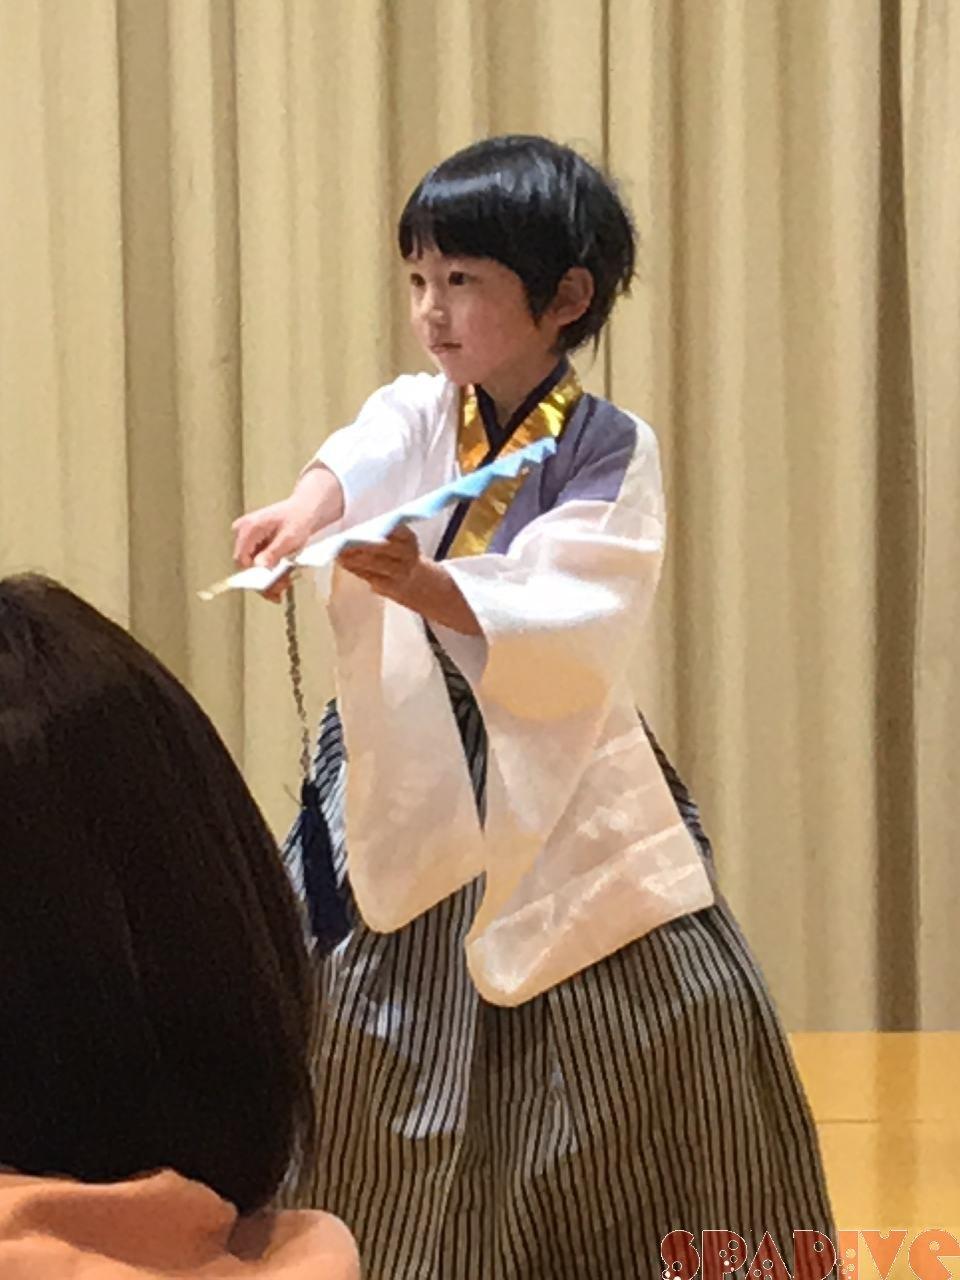 6歳長男最後の保育園発表会も制限開催|袴姿で男花♪2/5/2021